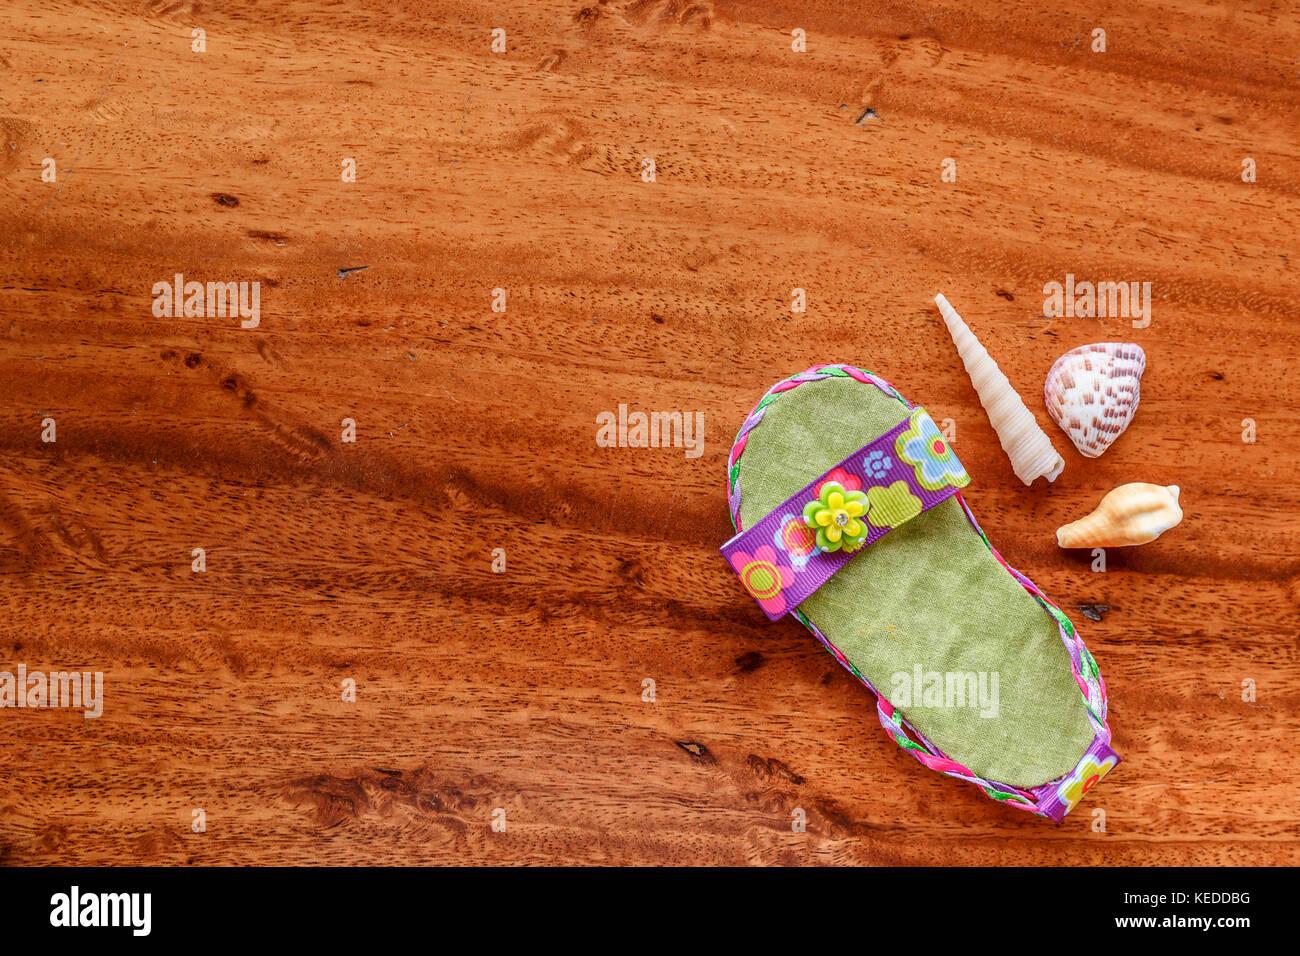 Purple baby sandal with seashells arranged on a wood grain background. Minimalist style appearance - Stock Image